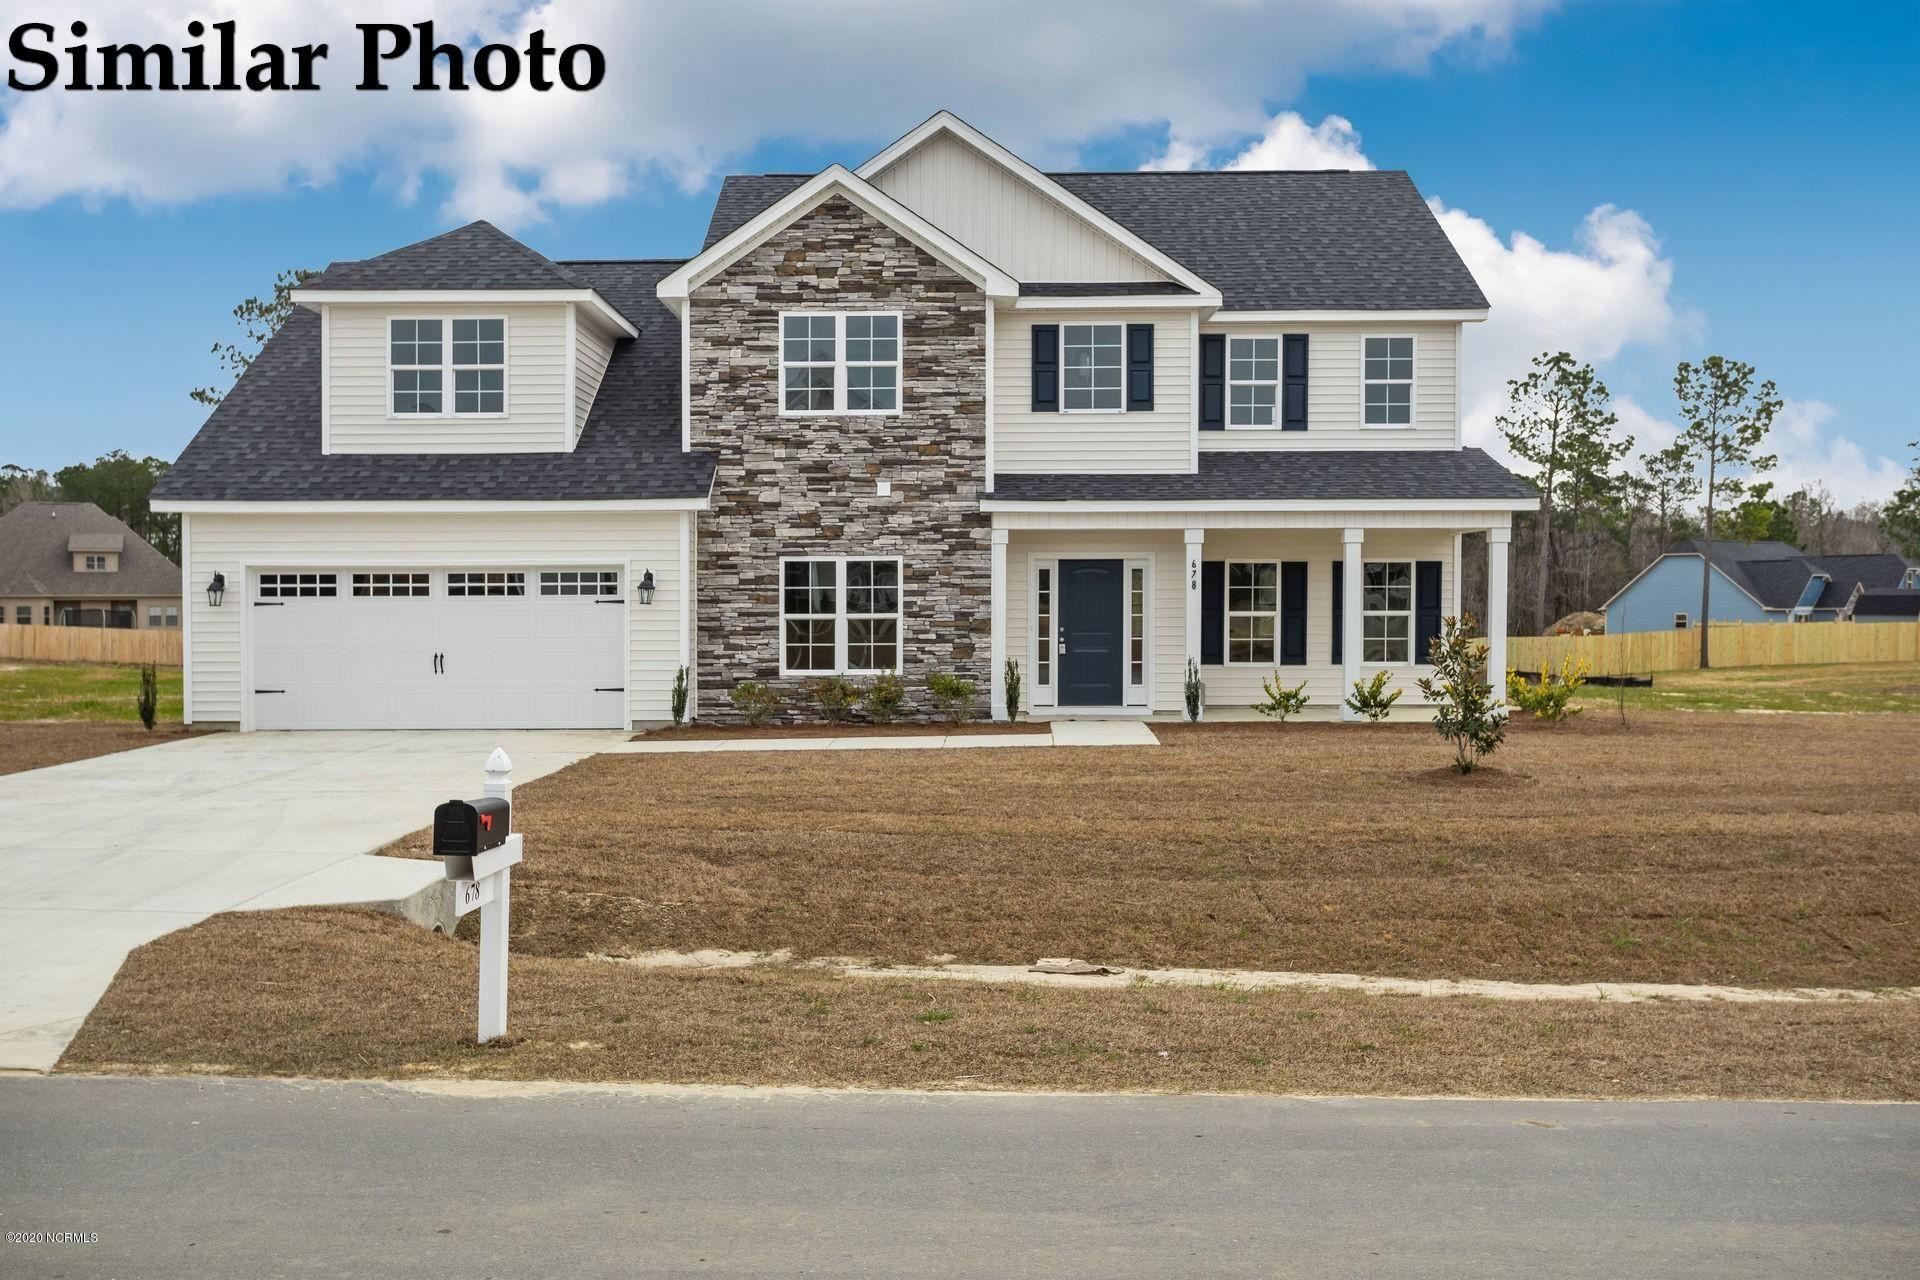 Photo of 527 Misty Pond Drive, Hubert, NC 28539 (MLS # 100292533)